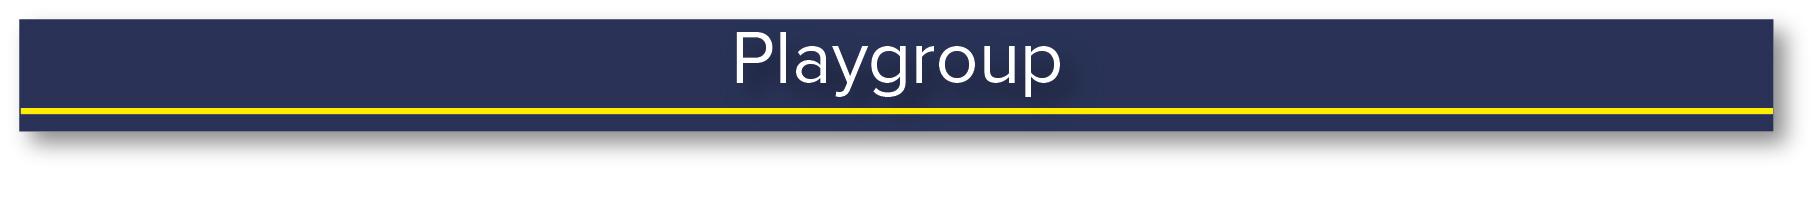 Playgroup heading.jpg